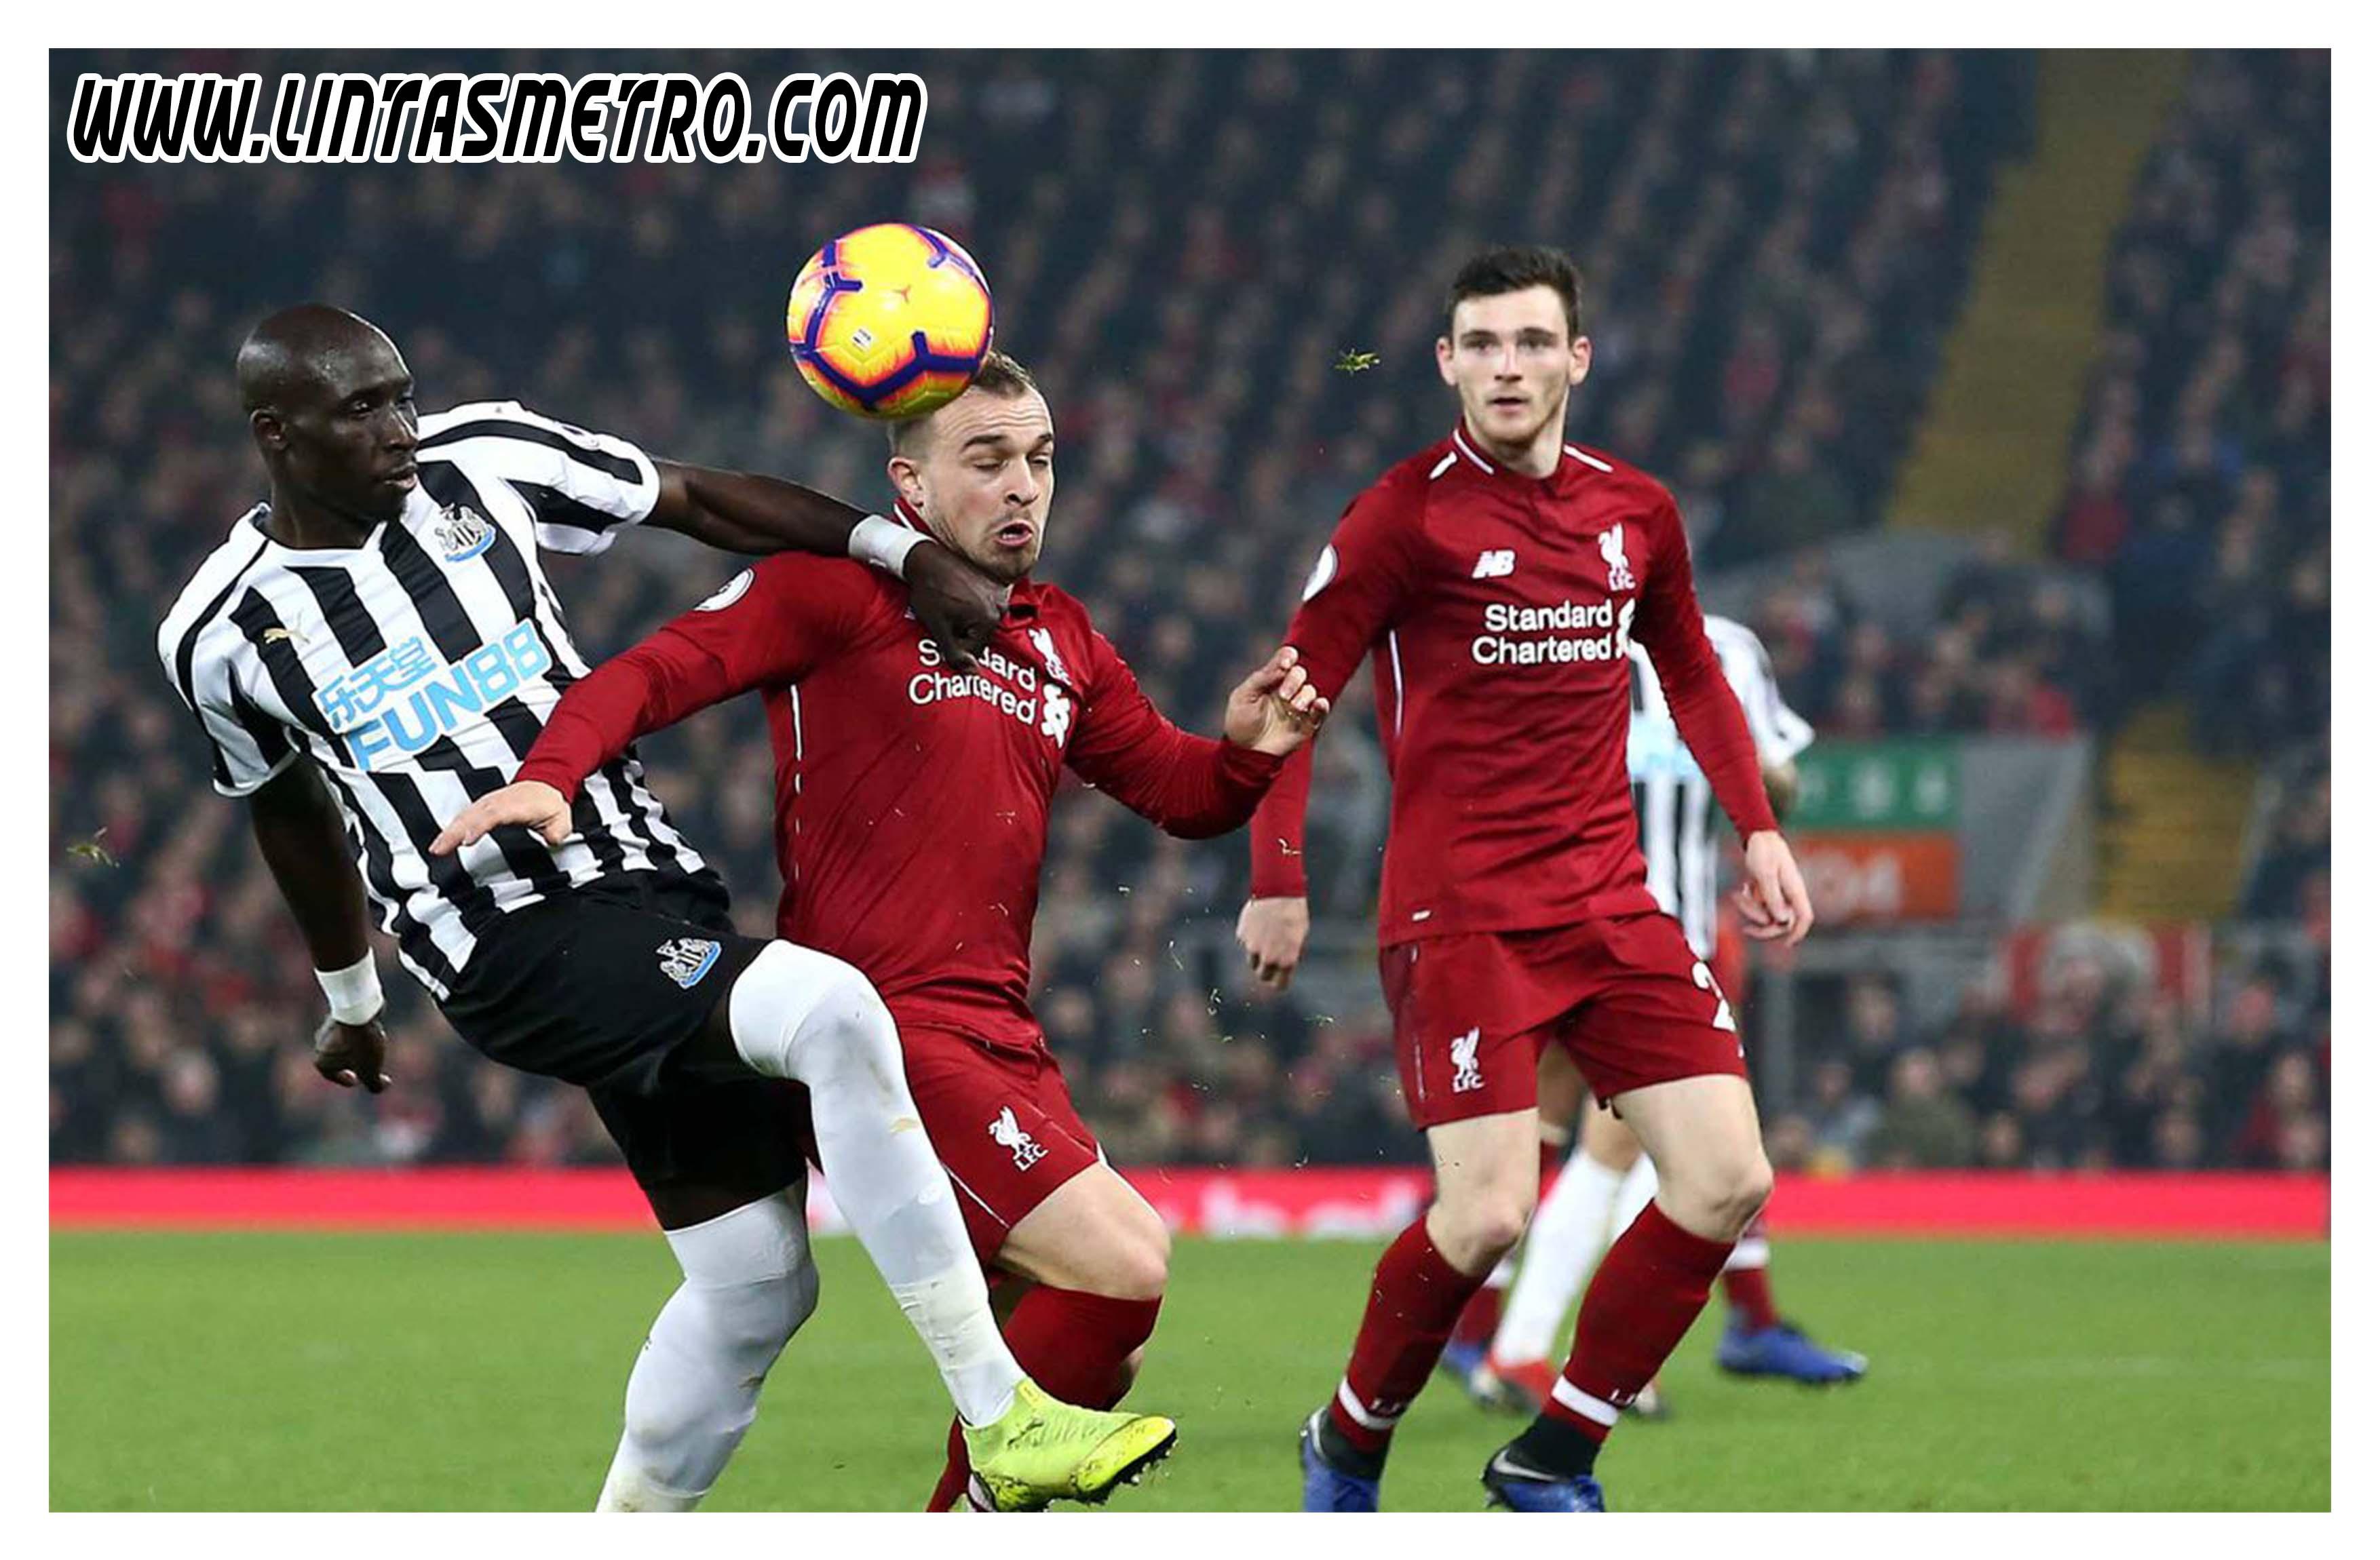 Newcastle United vs Liverpool Prediksi Liga Inggris 2020/21